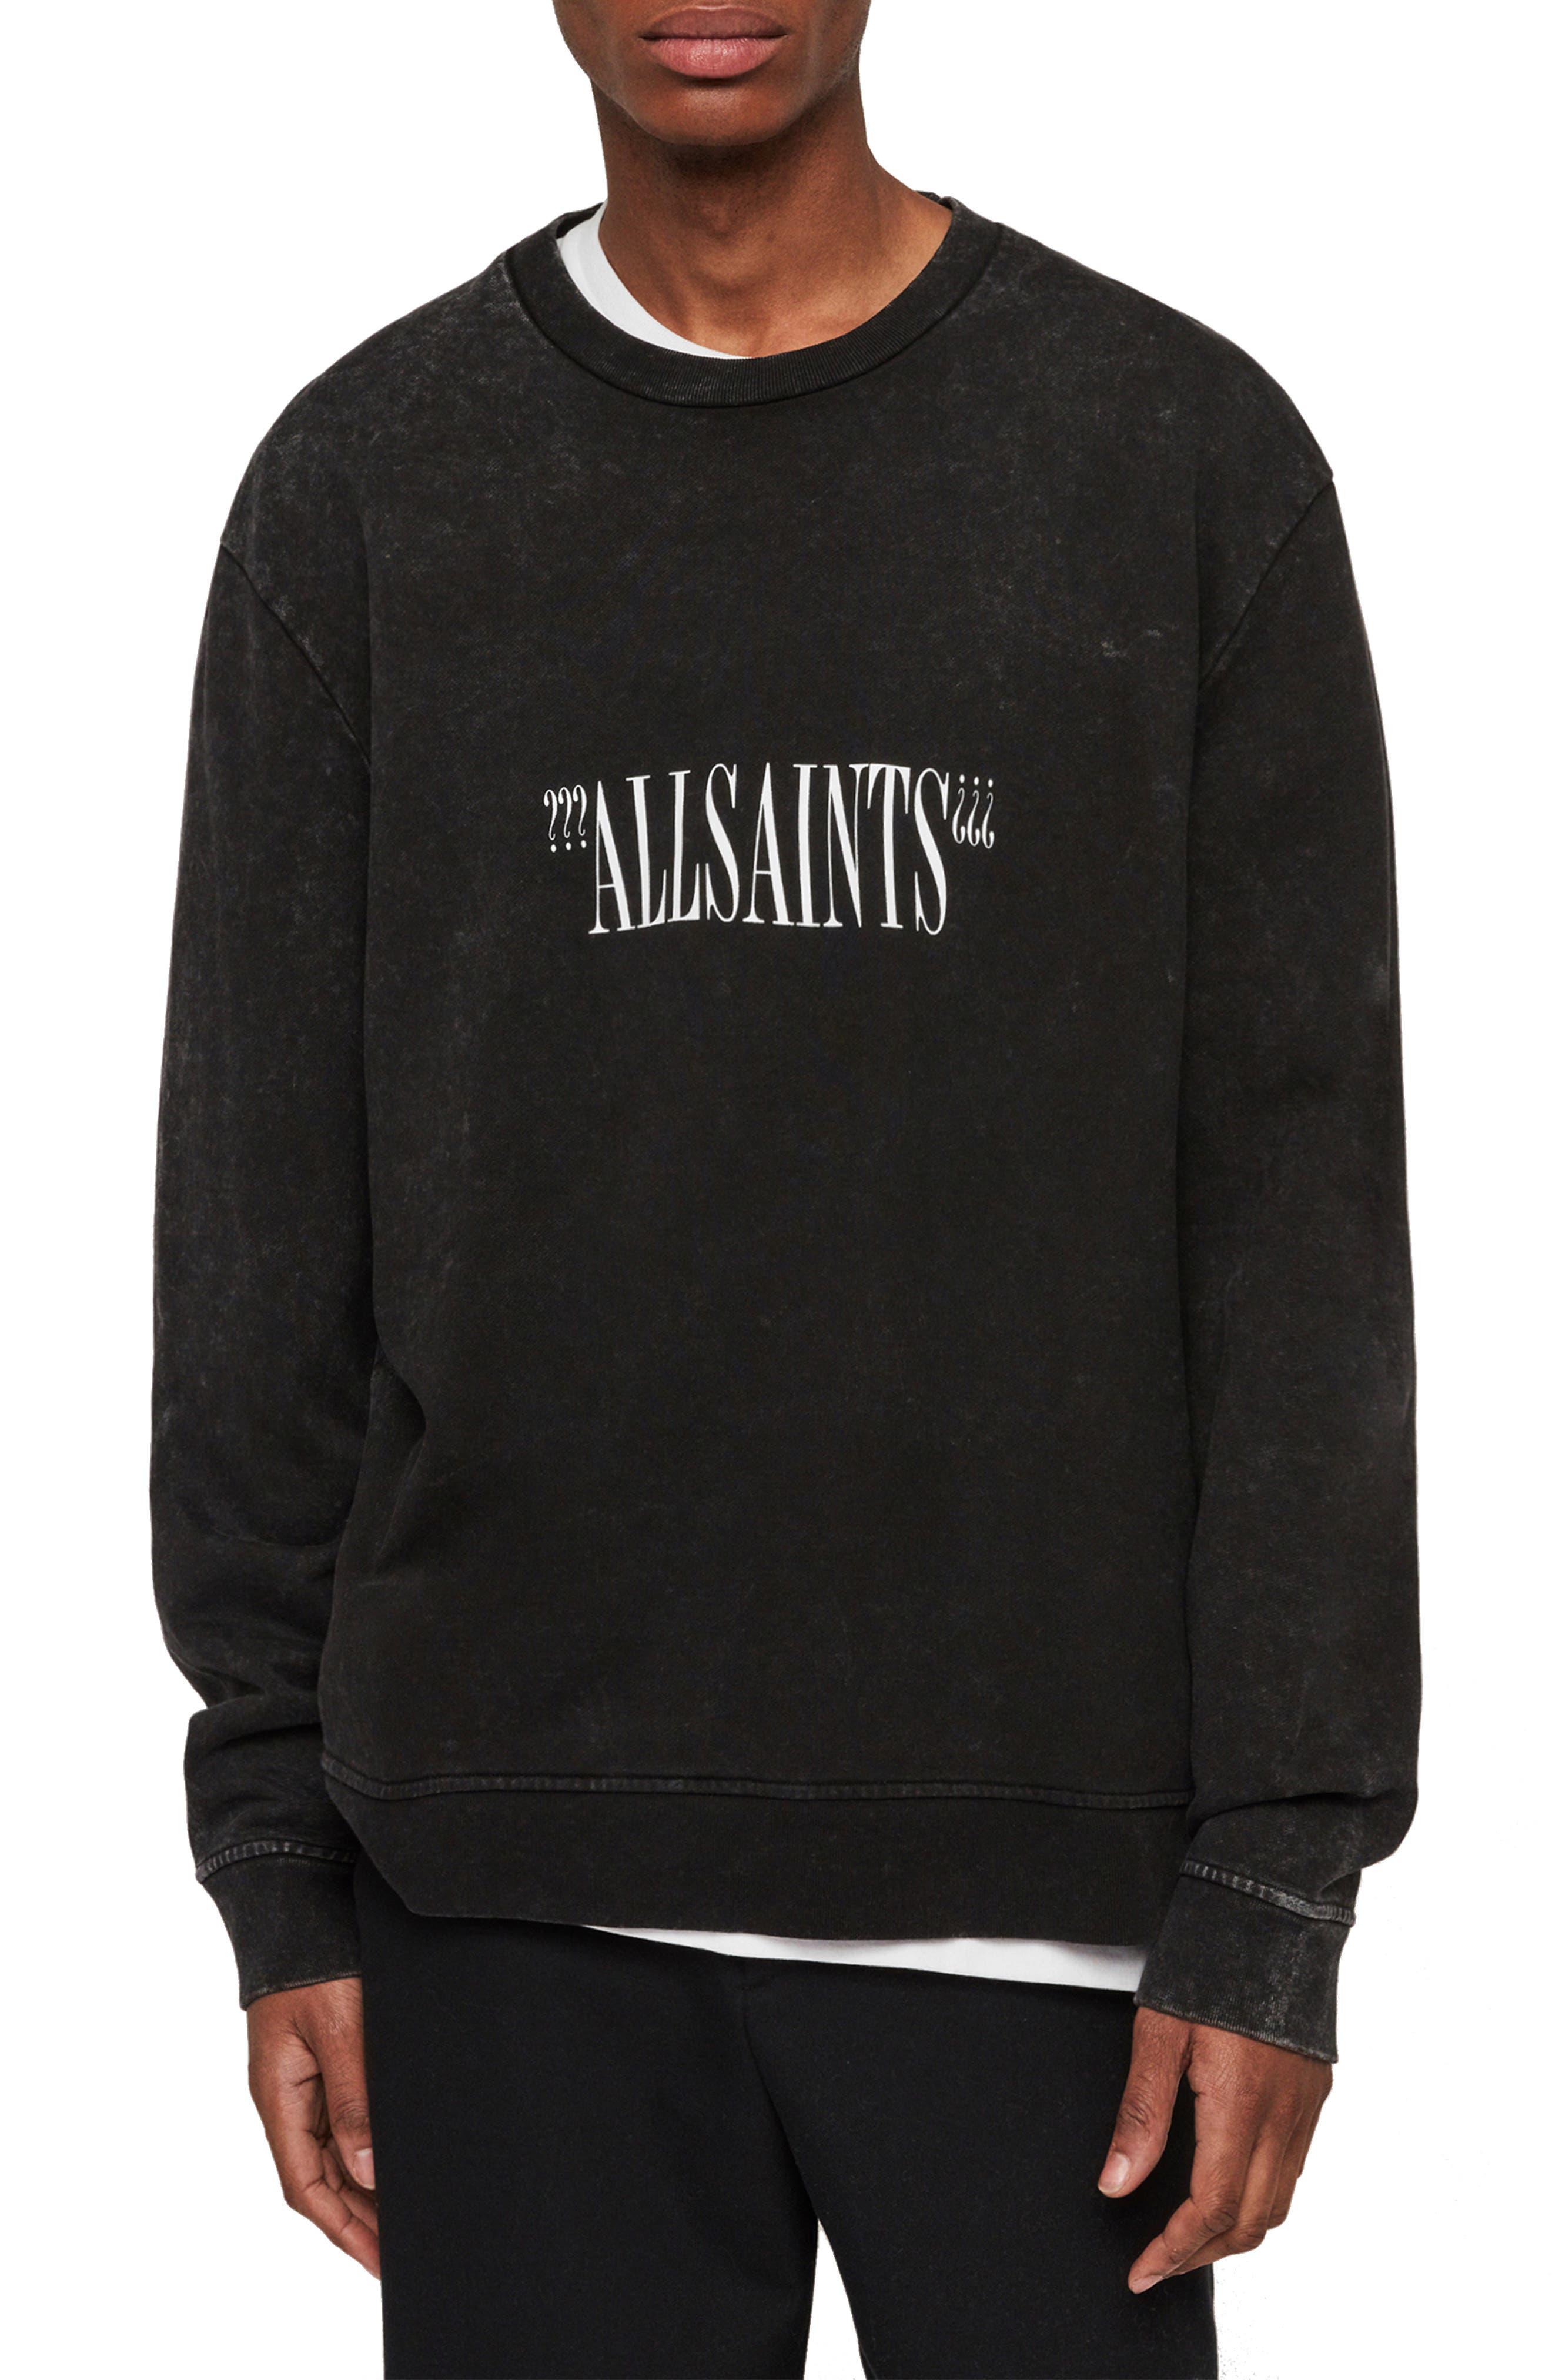 ALLSAINTS, Brackets Logo Graphic Fleece Sweatshirt, Main thumbnail 1, color, ACID WASHED BLACK